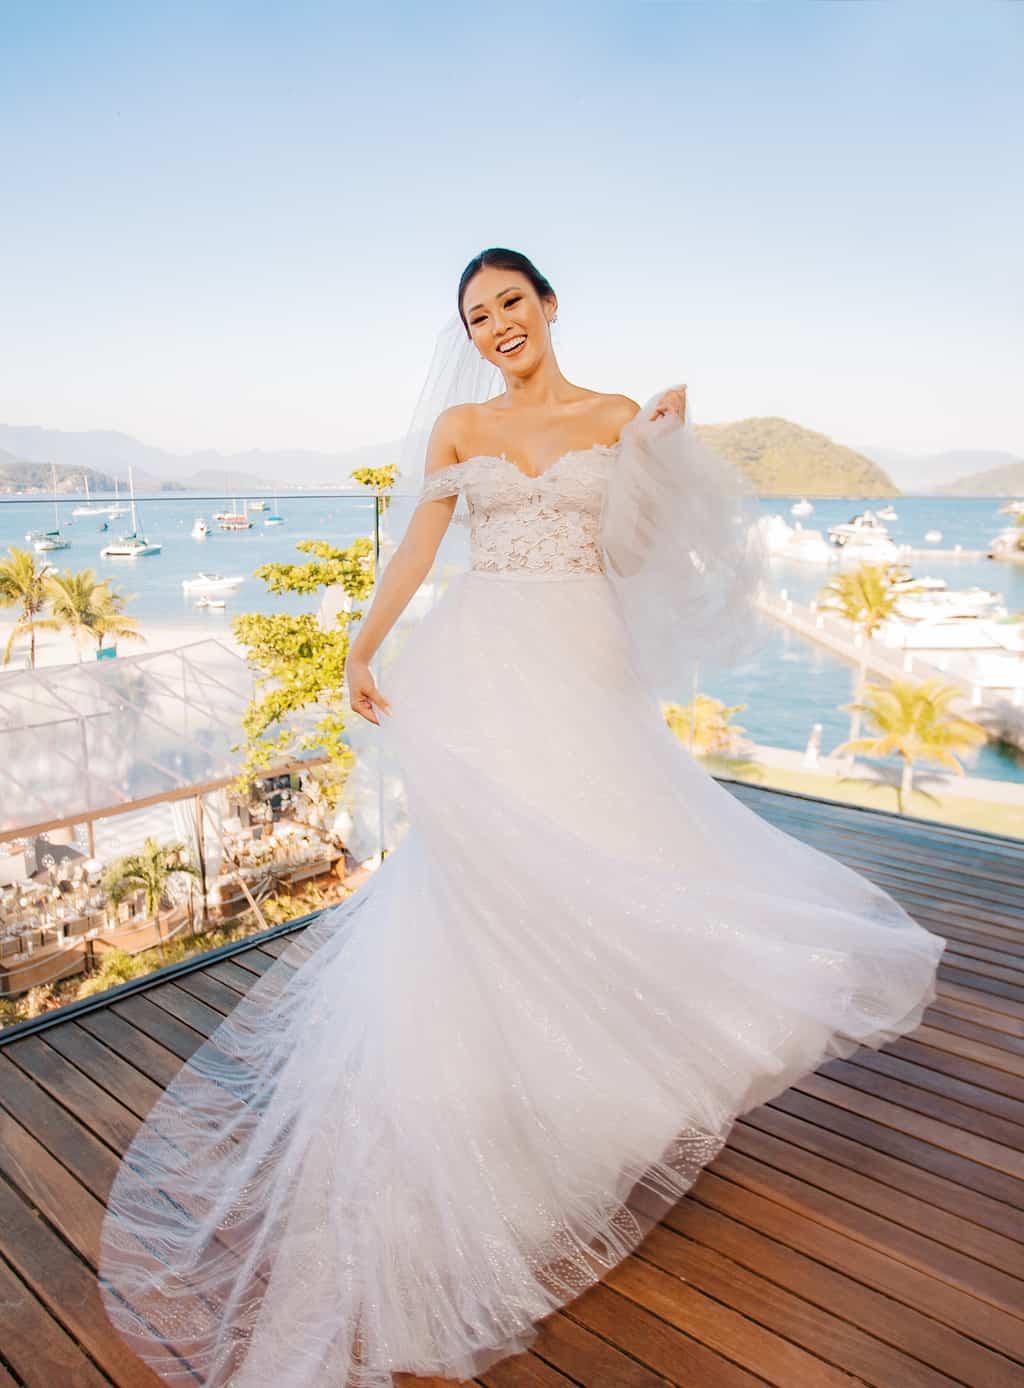 Casamento-Alissa-e-Gustavo-Cerimonial-Manu-Goncalez-Decor-Andrea-Kapps-Fasano-Angra-dos-Reis-Foto-VRebel-G-Junior-Making-of2120-Edit